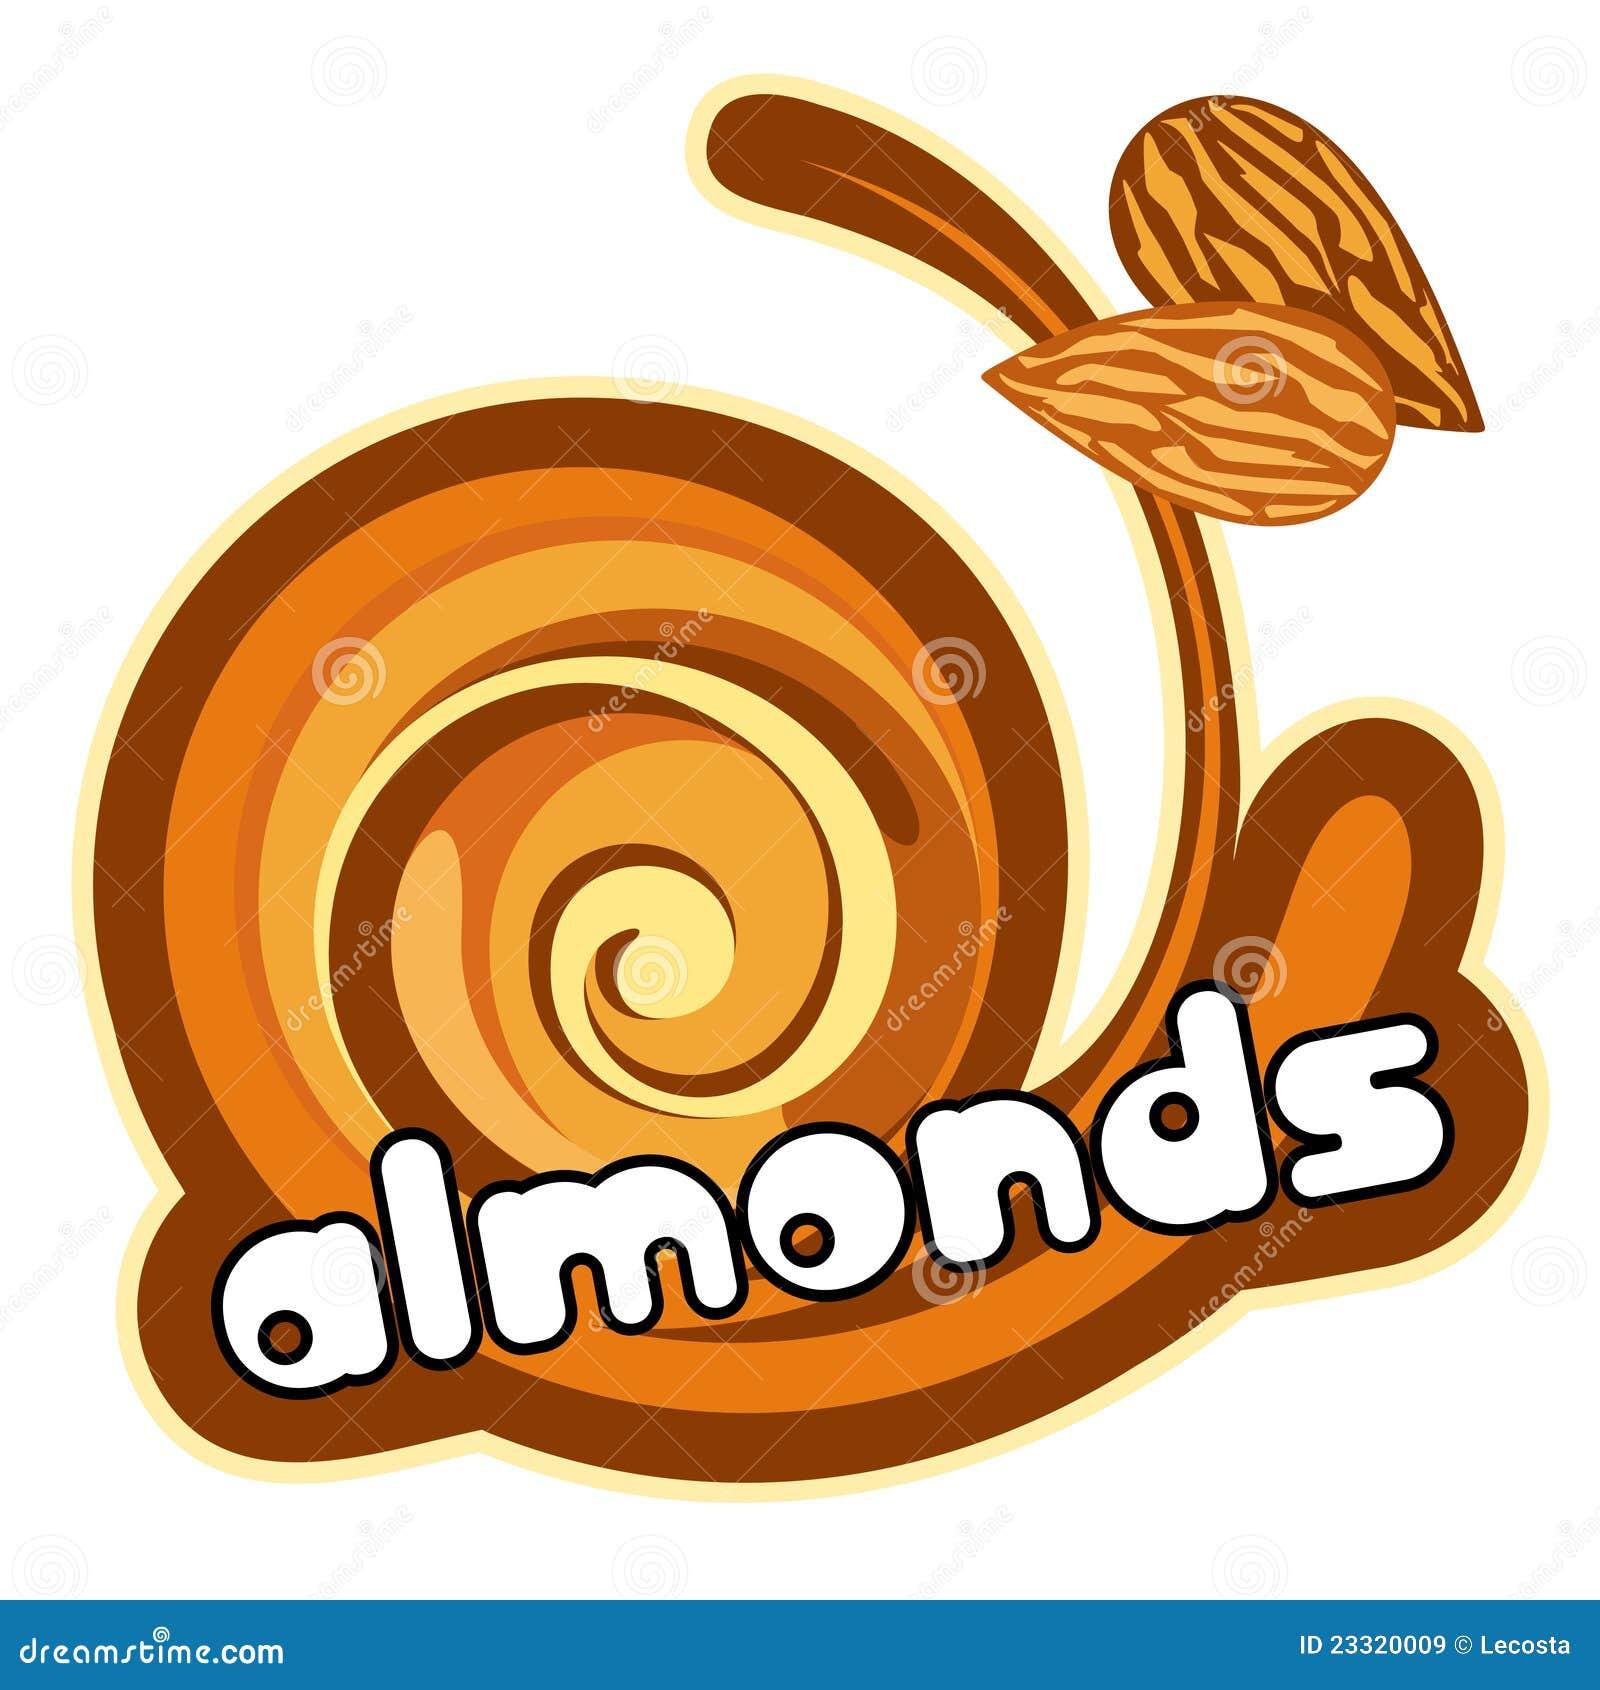 Ice cream almond